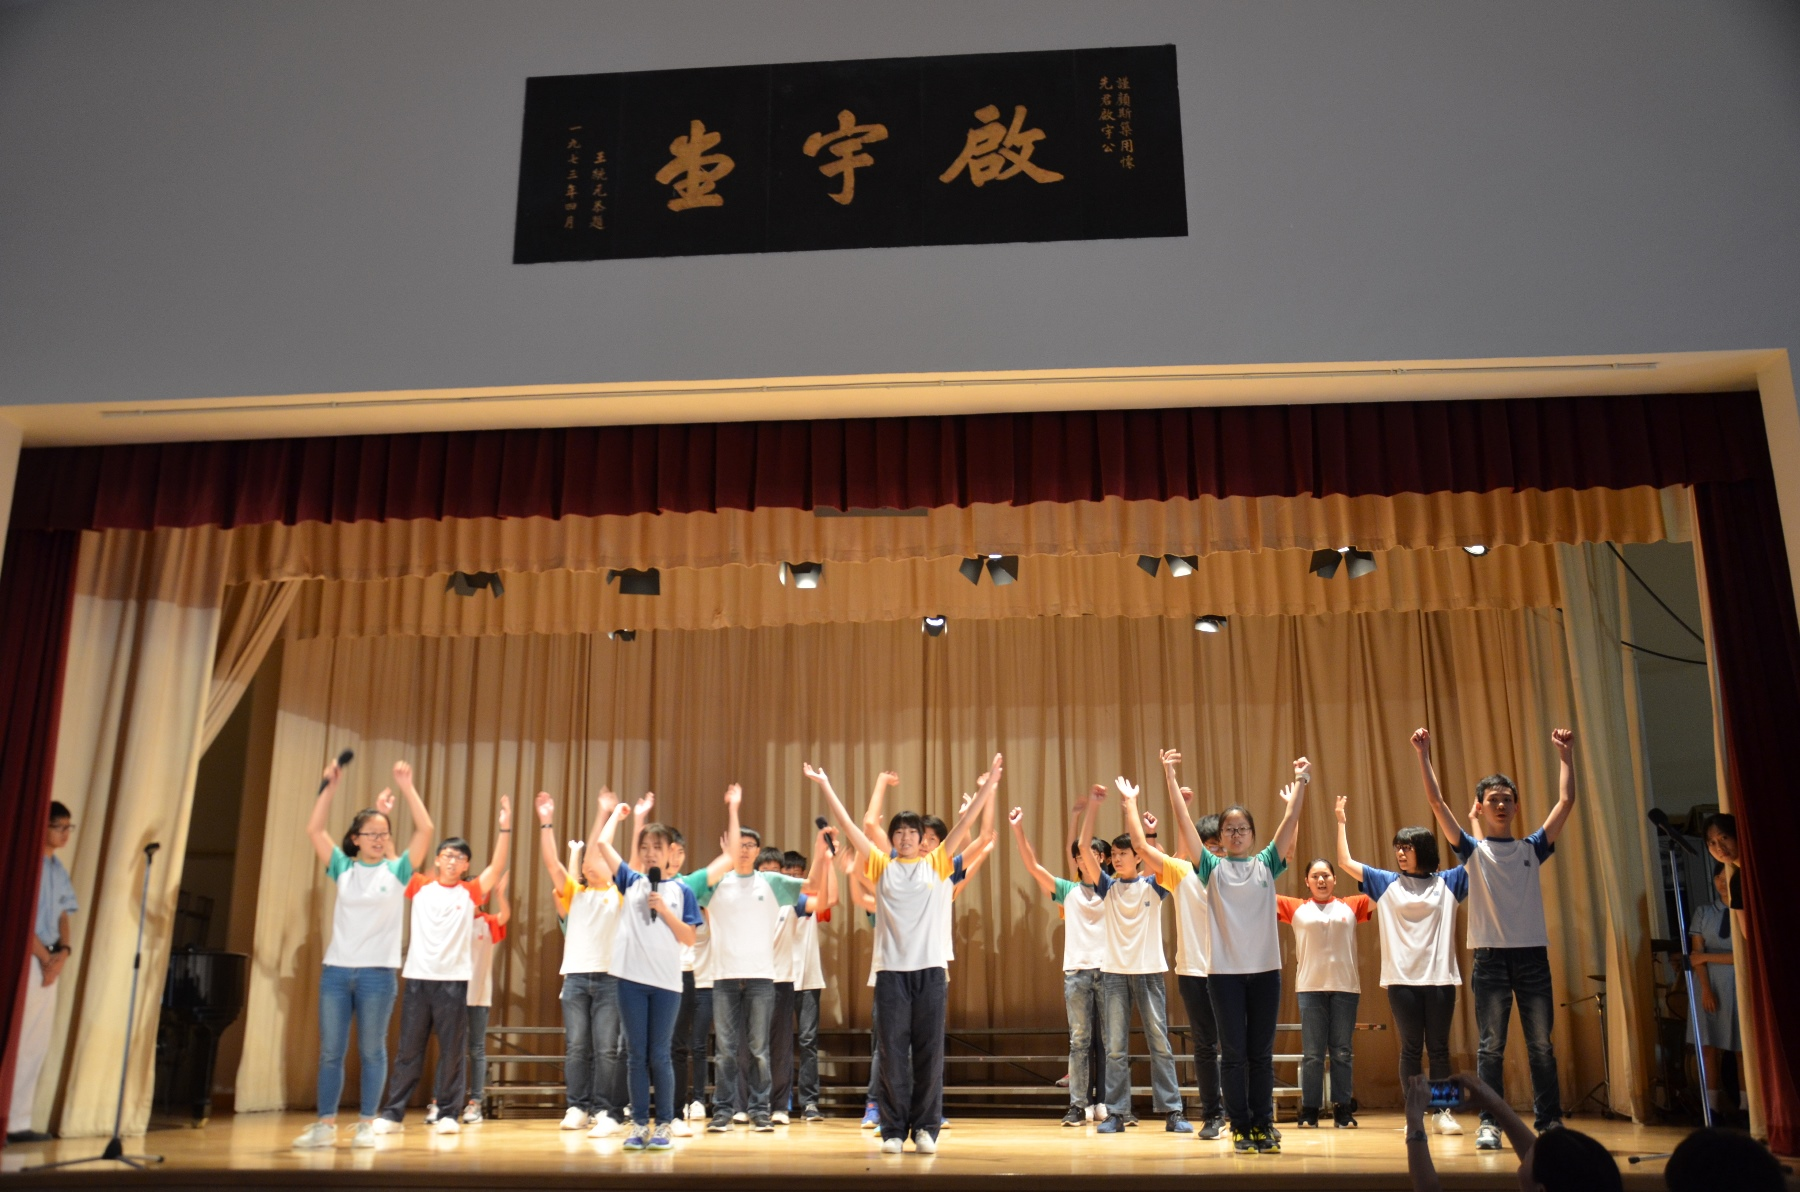 http://www.npc.edu.hk/sites/default/files/dsc_7375.jpg